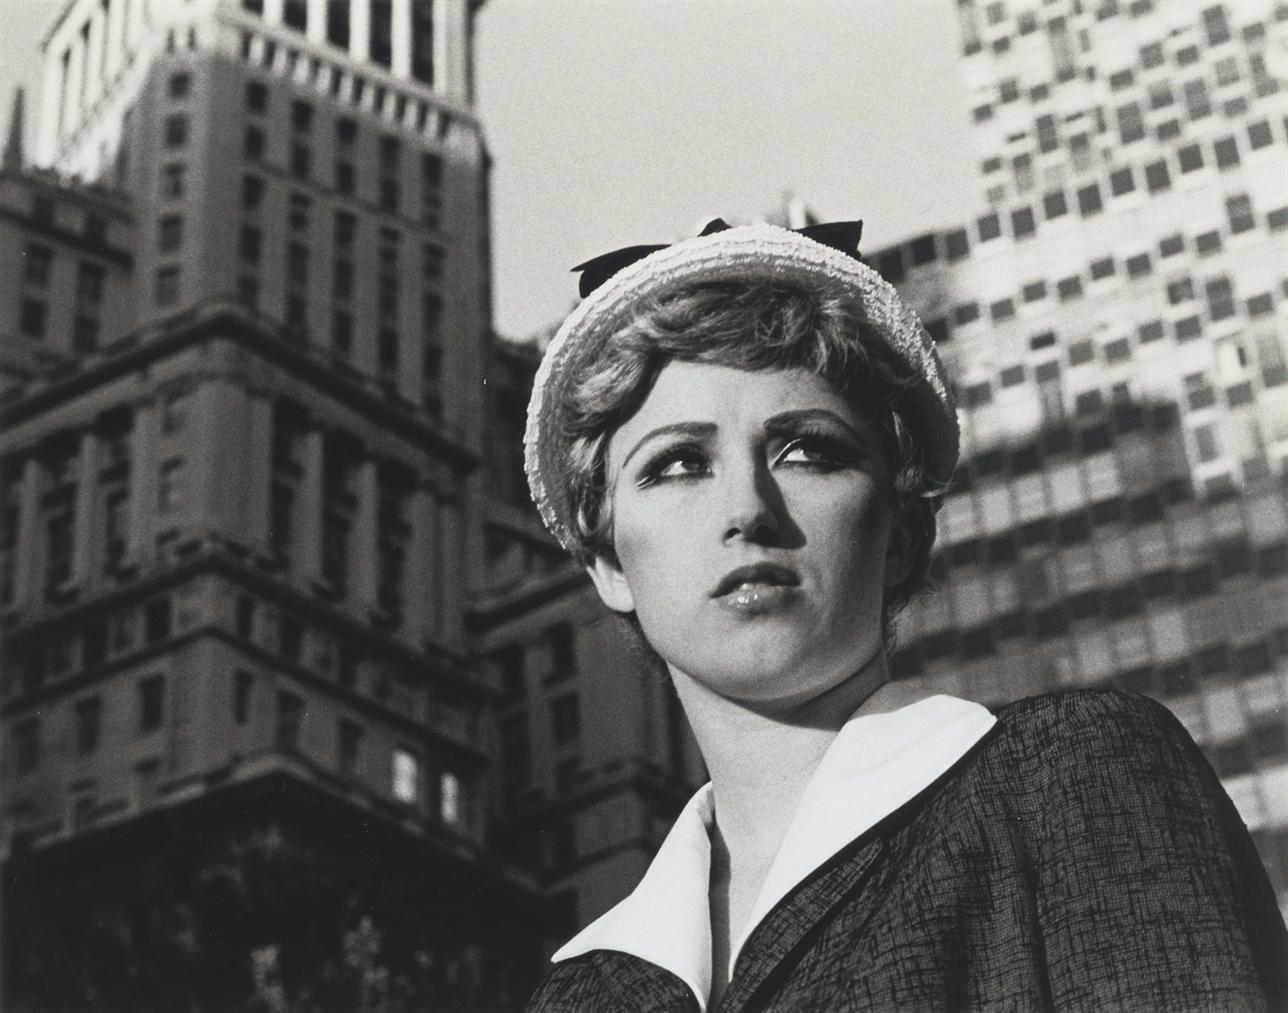 Cindy Sherman-Untitled Film Still #21-1978